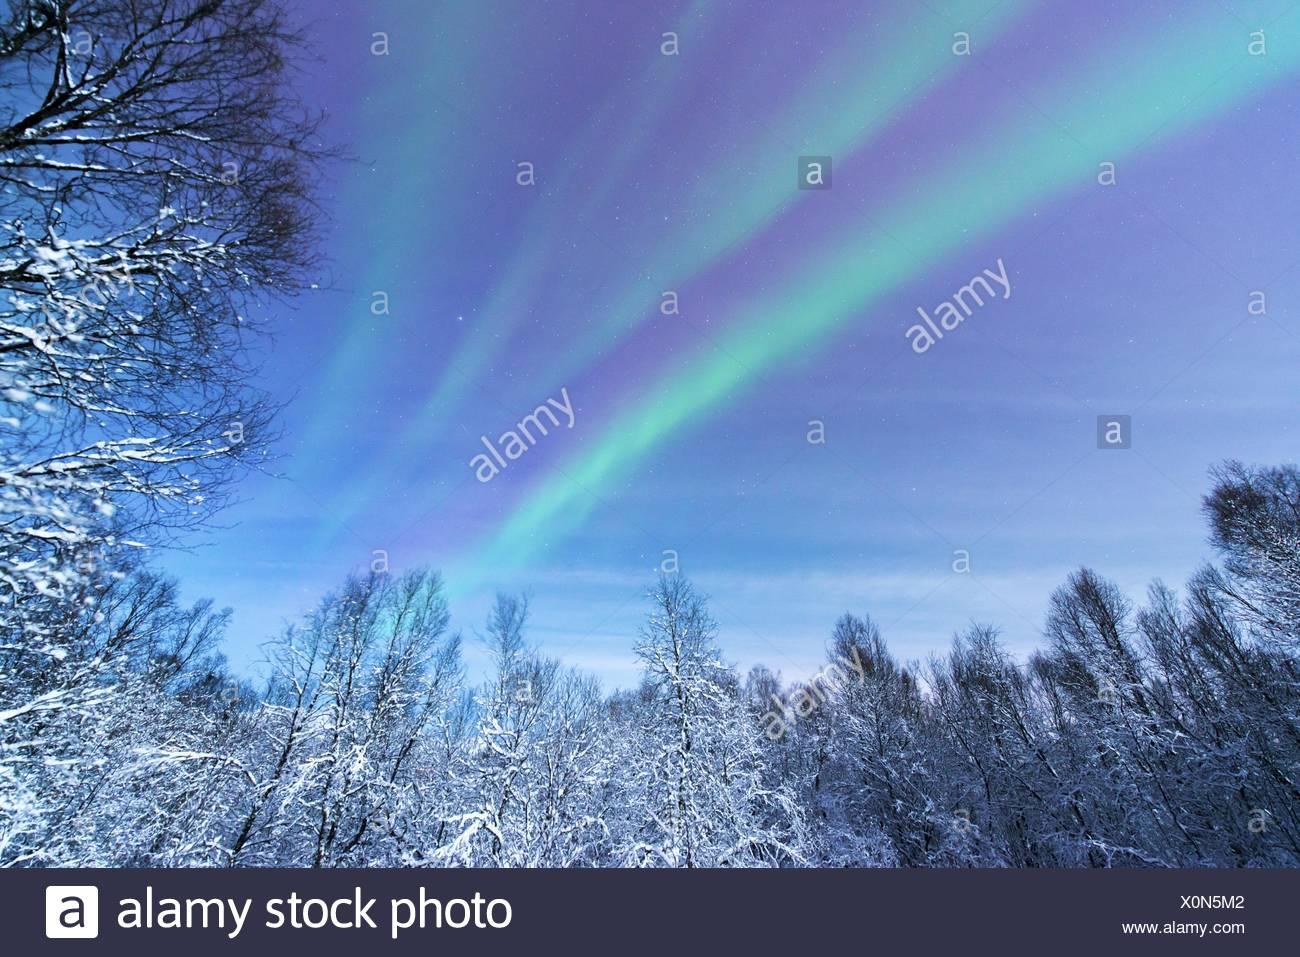 aurora above snowy forest scenery, Norway, Troms, Tromsoe - Stock Image